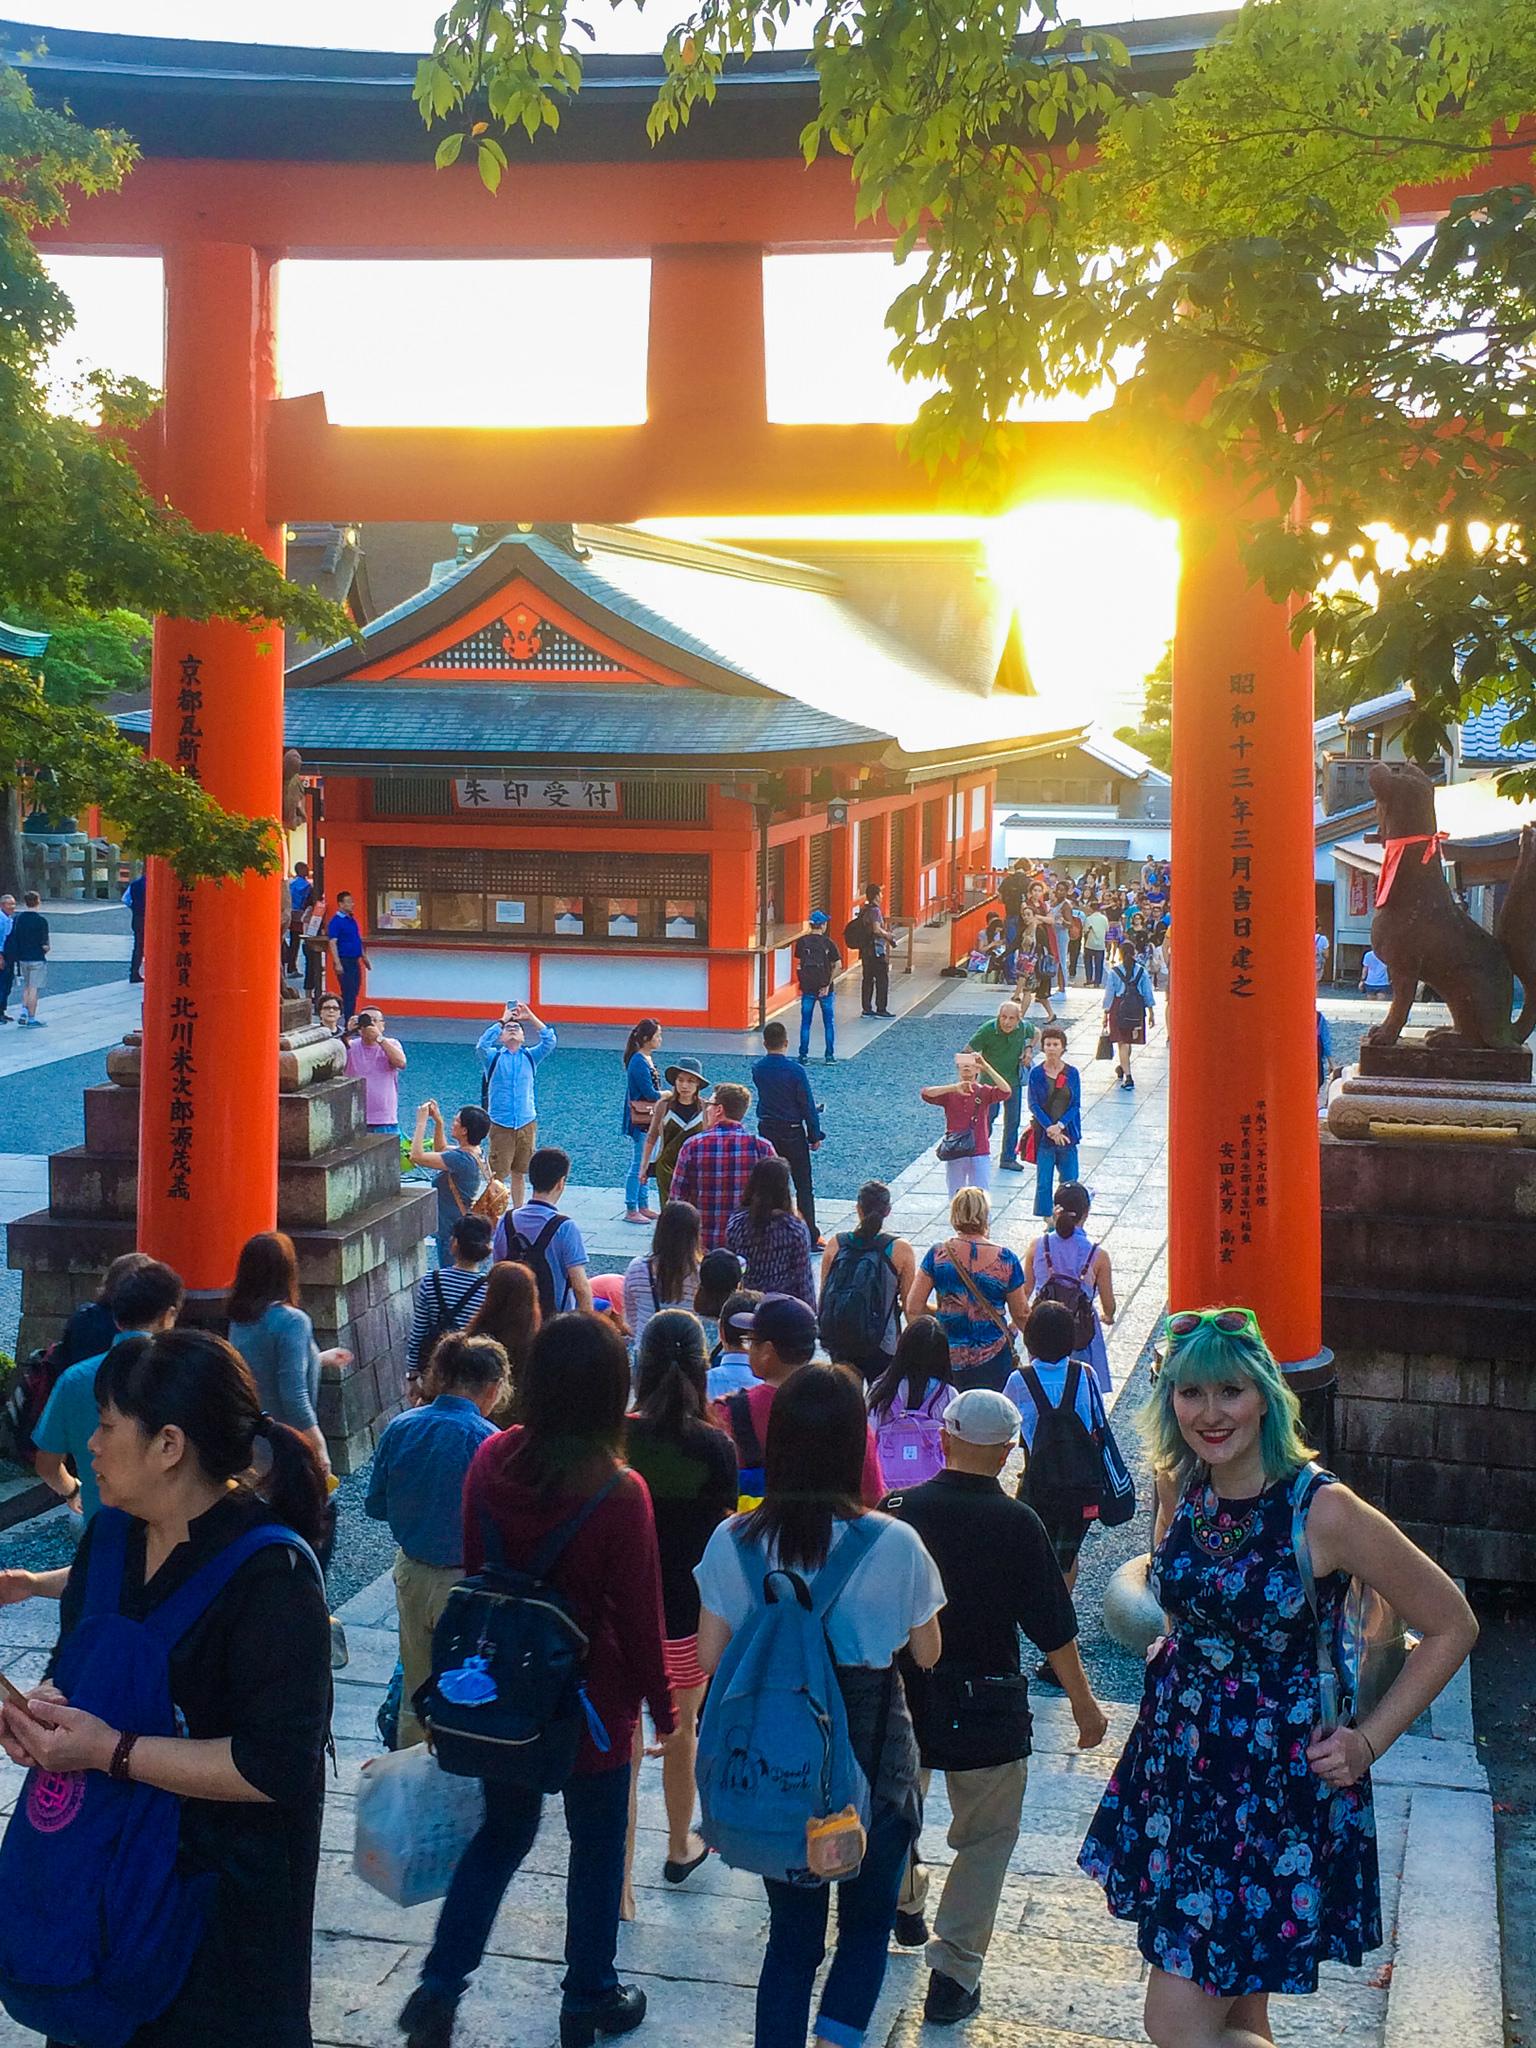 30254197542_97d3c92be7_k.jpgThe Ultimate Walking Tour of Kyoto's Incredible Fushimi Inari Shrine's 10,000 torii gates